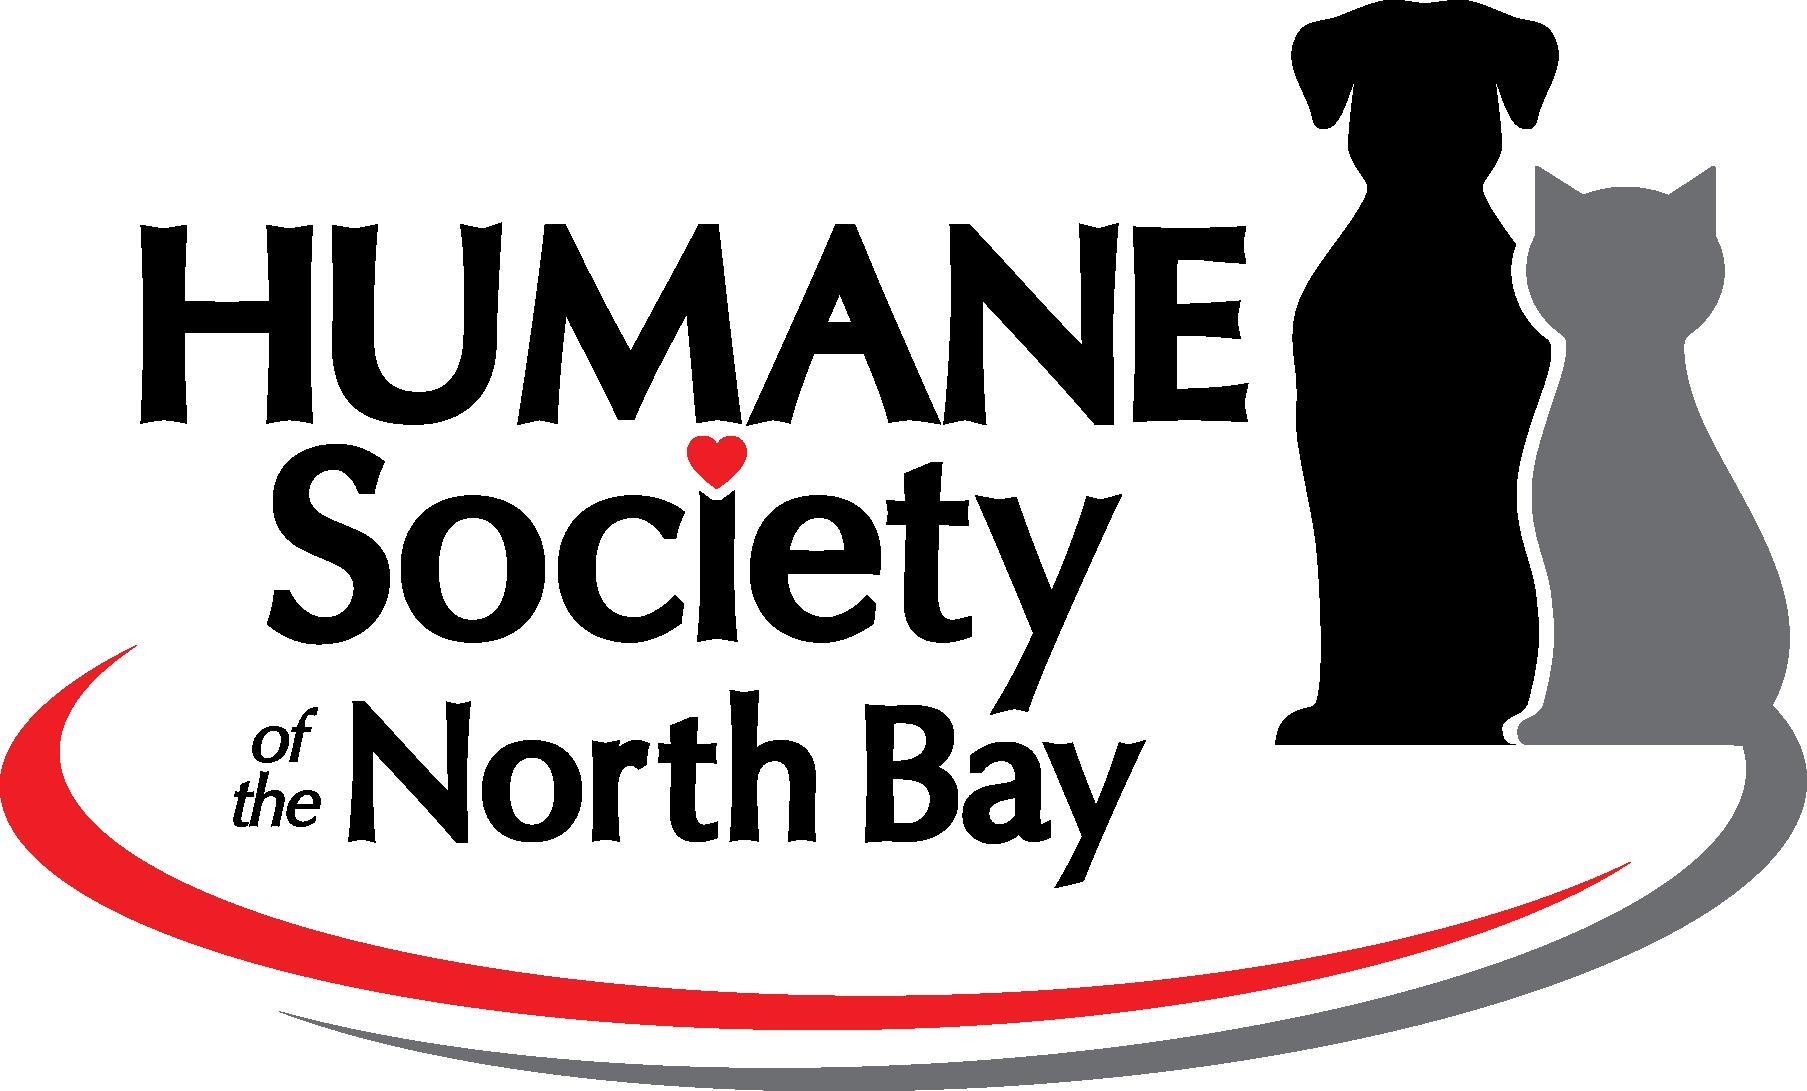 Humane Society of the North Bay